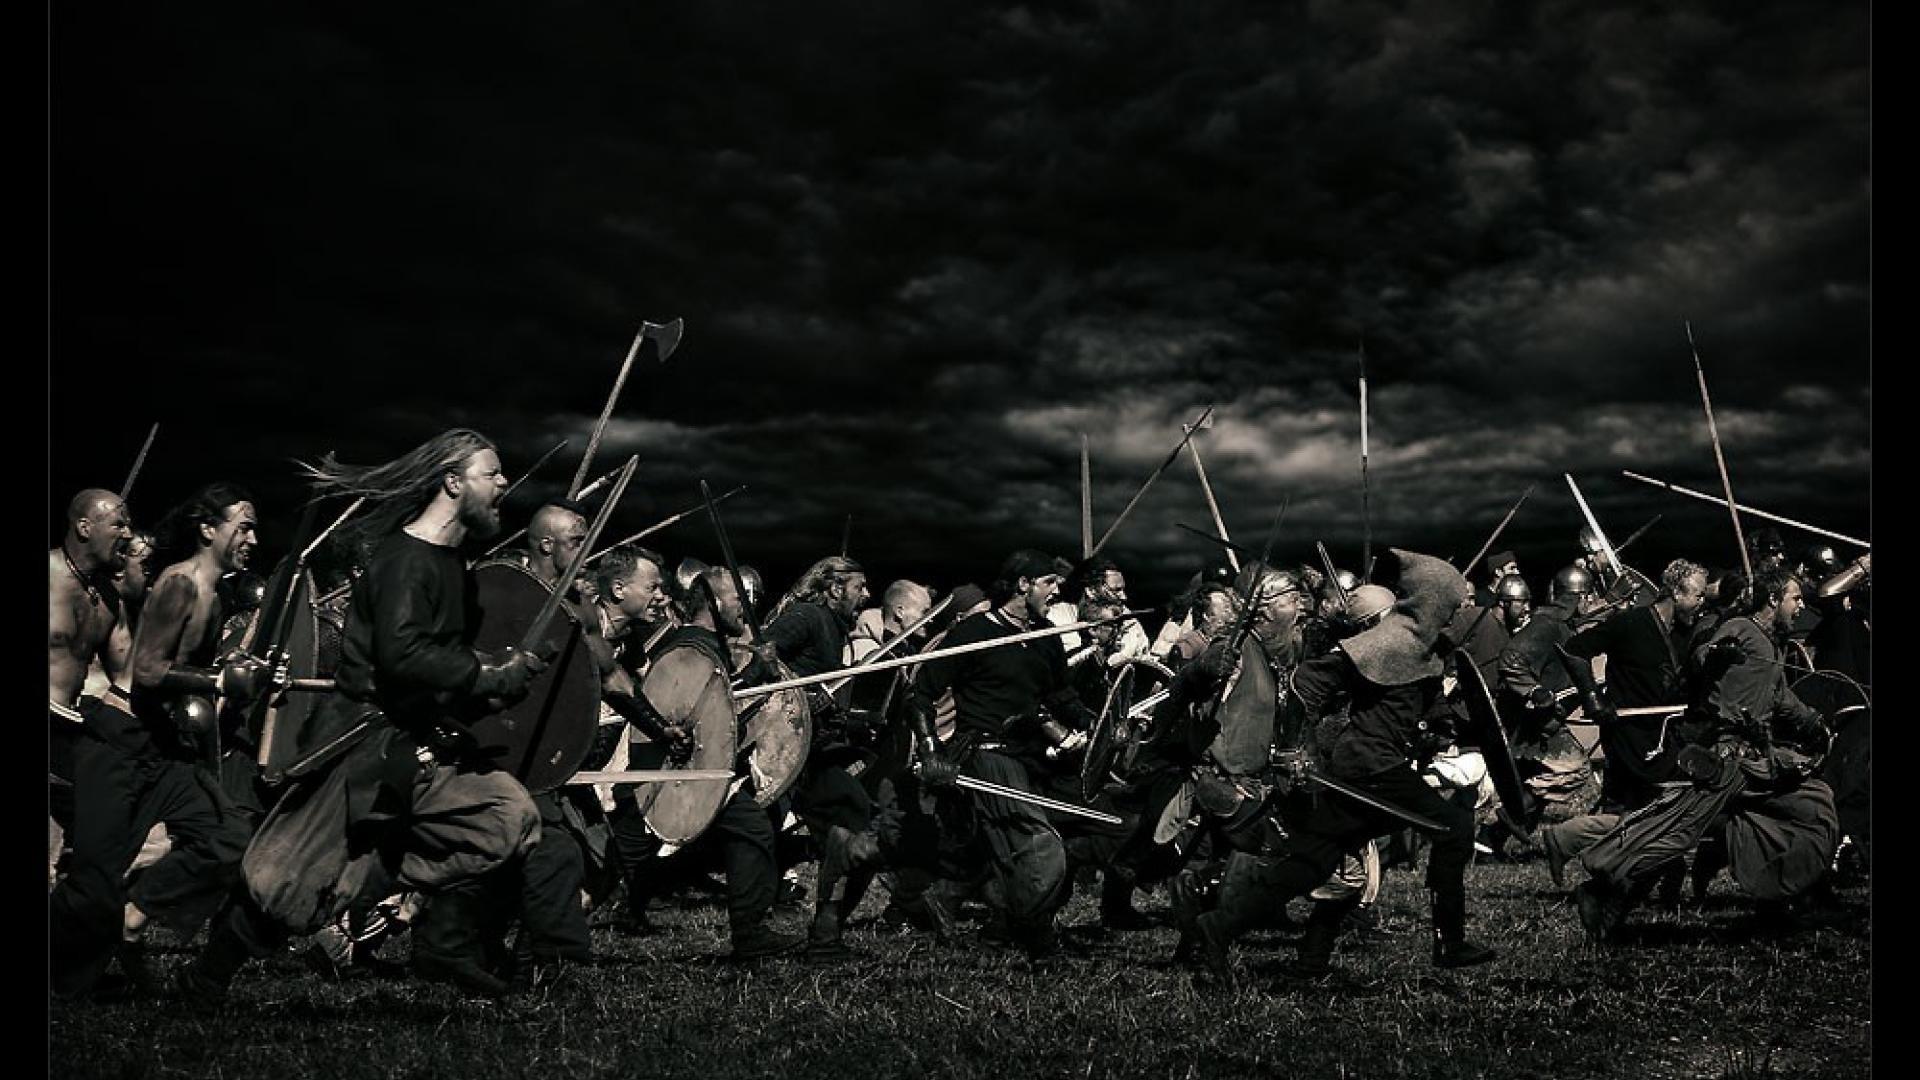 Viking Wallpapers for Desktop (px, 225.24 Kb)